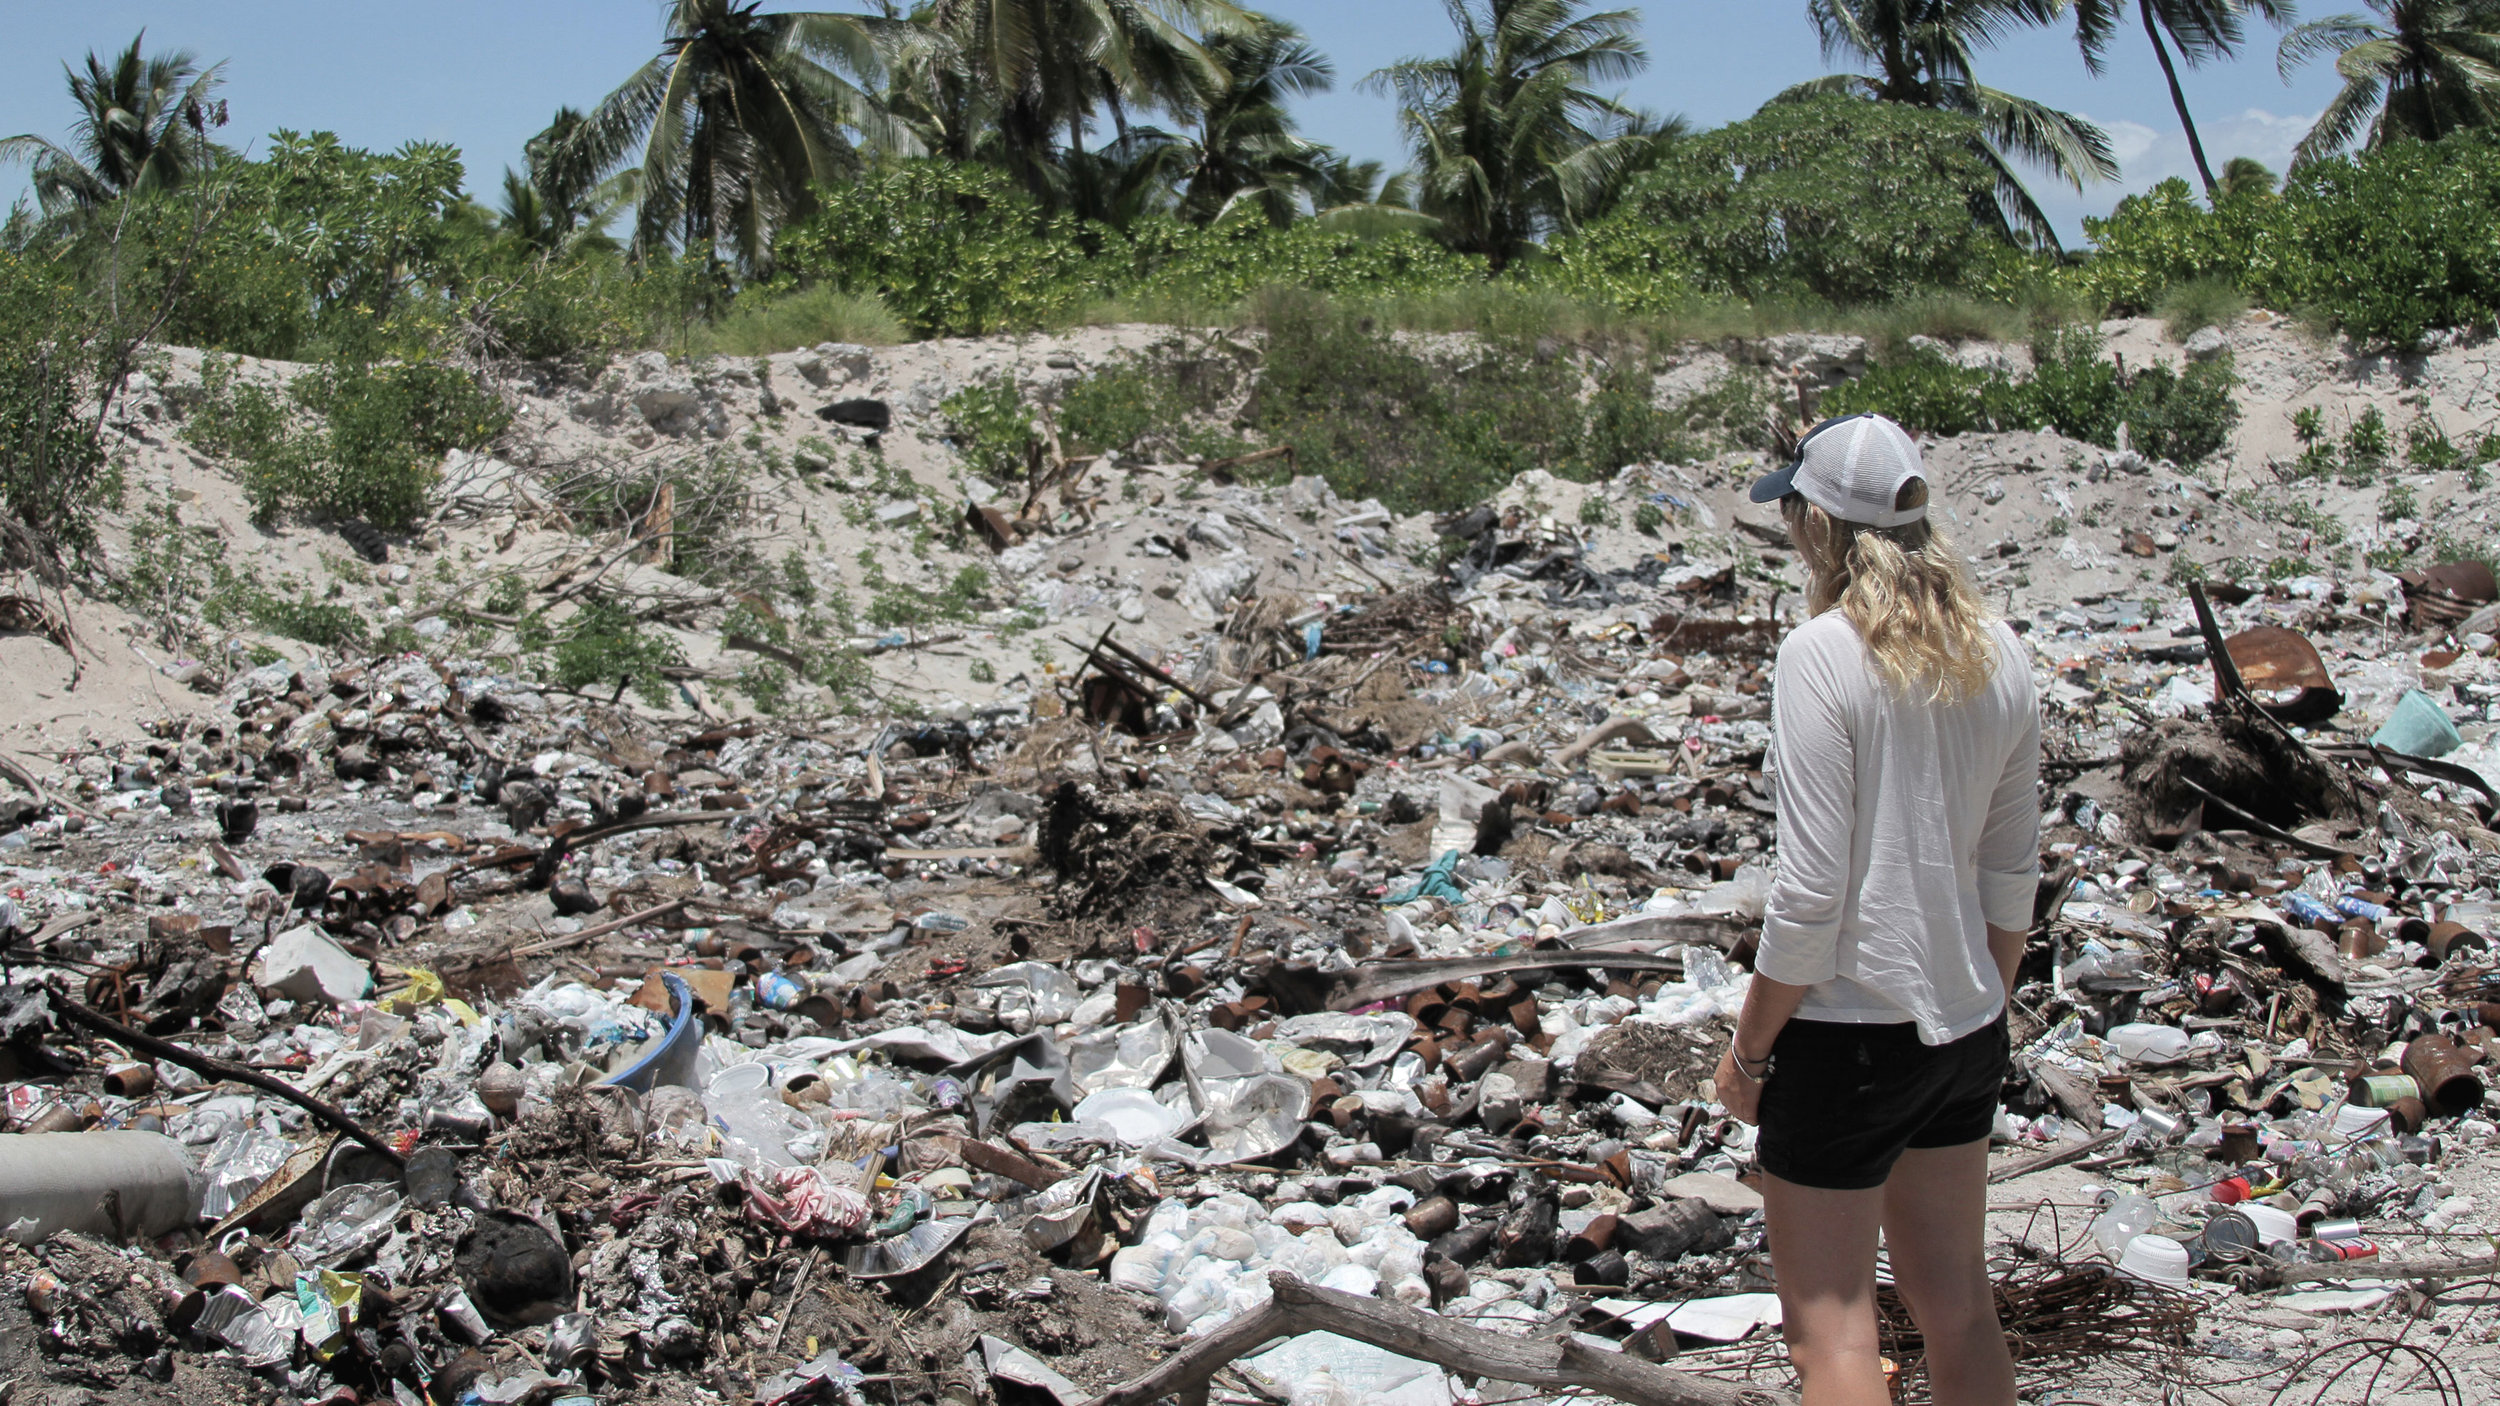 Kiritimati-Island-dumping-site---Kiribati copy.jpg